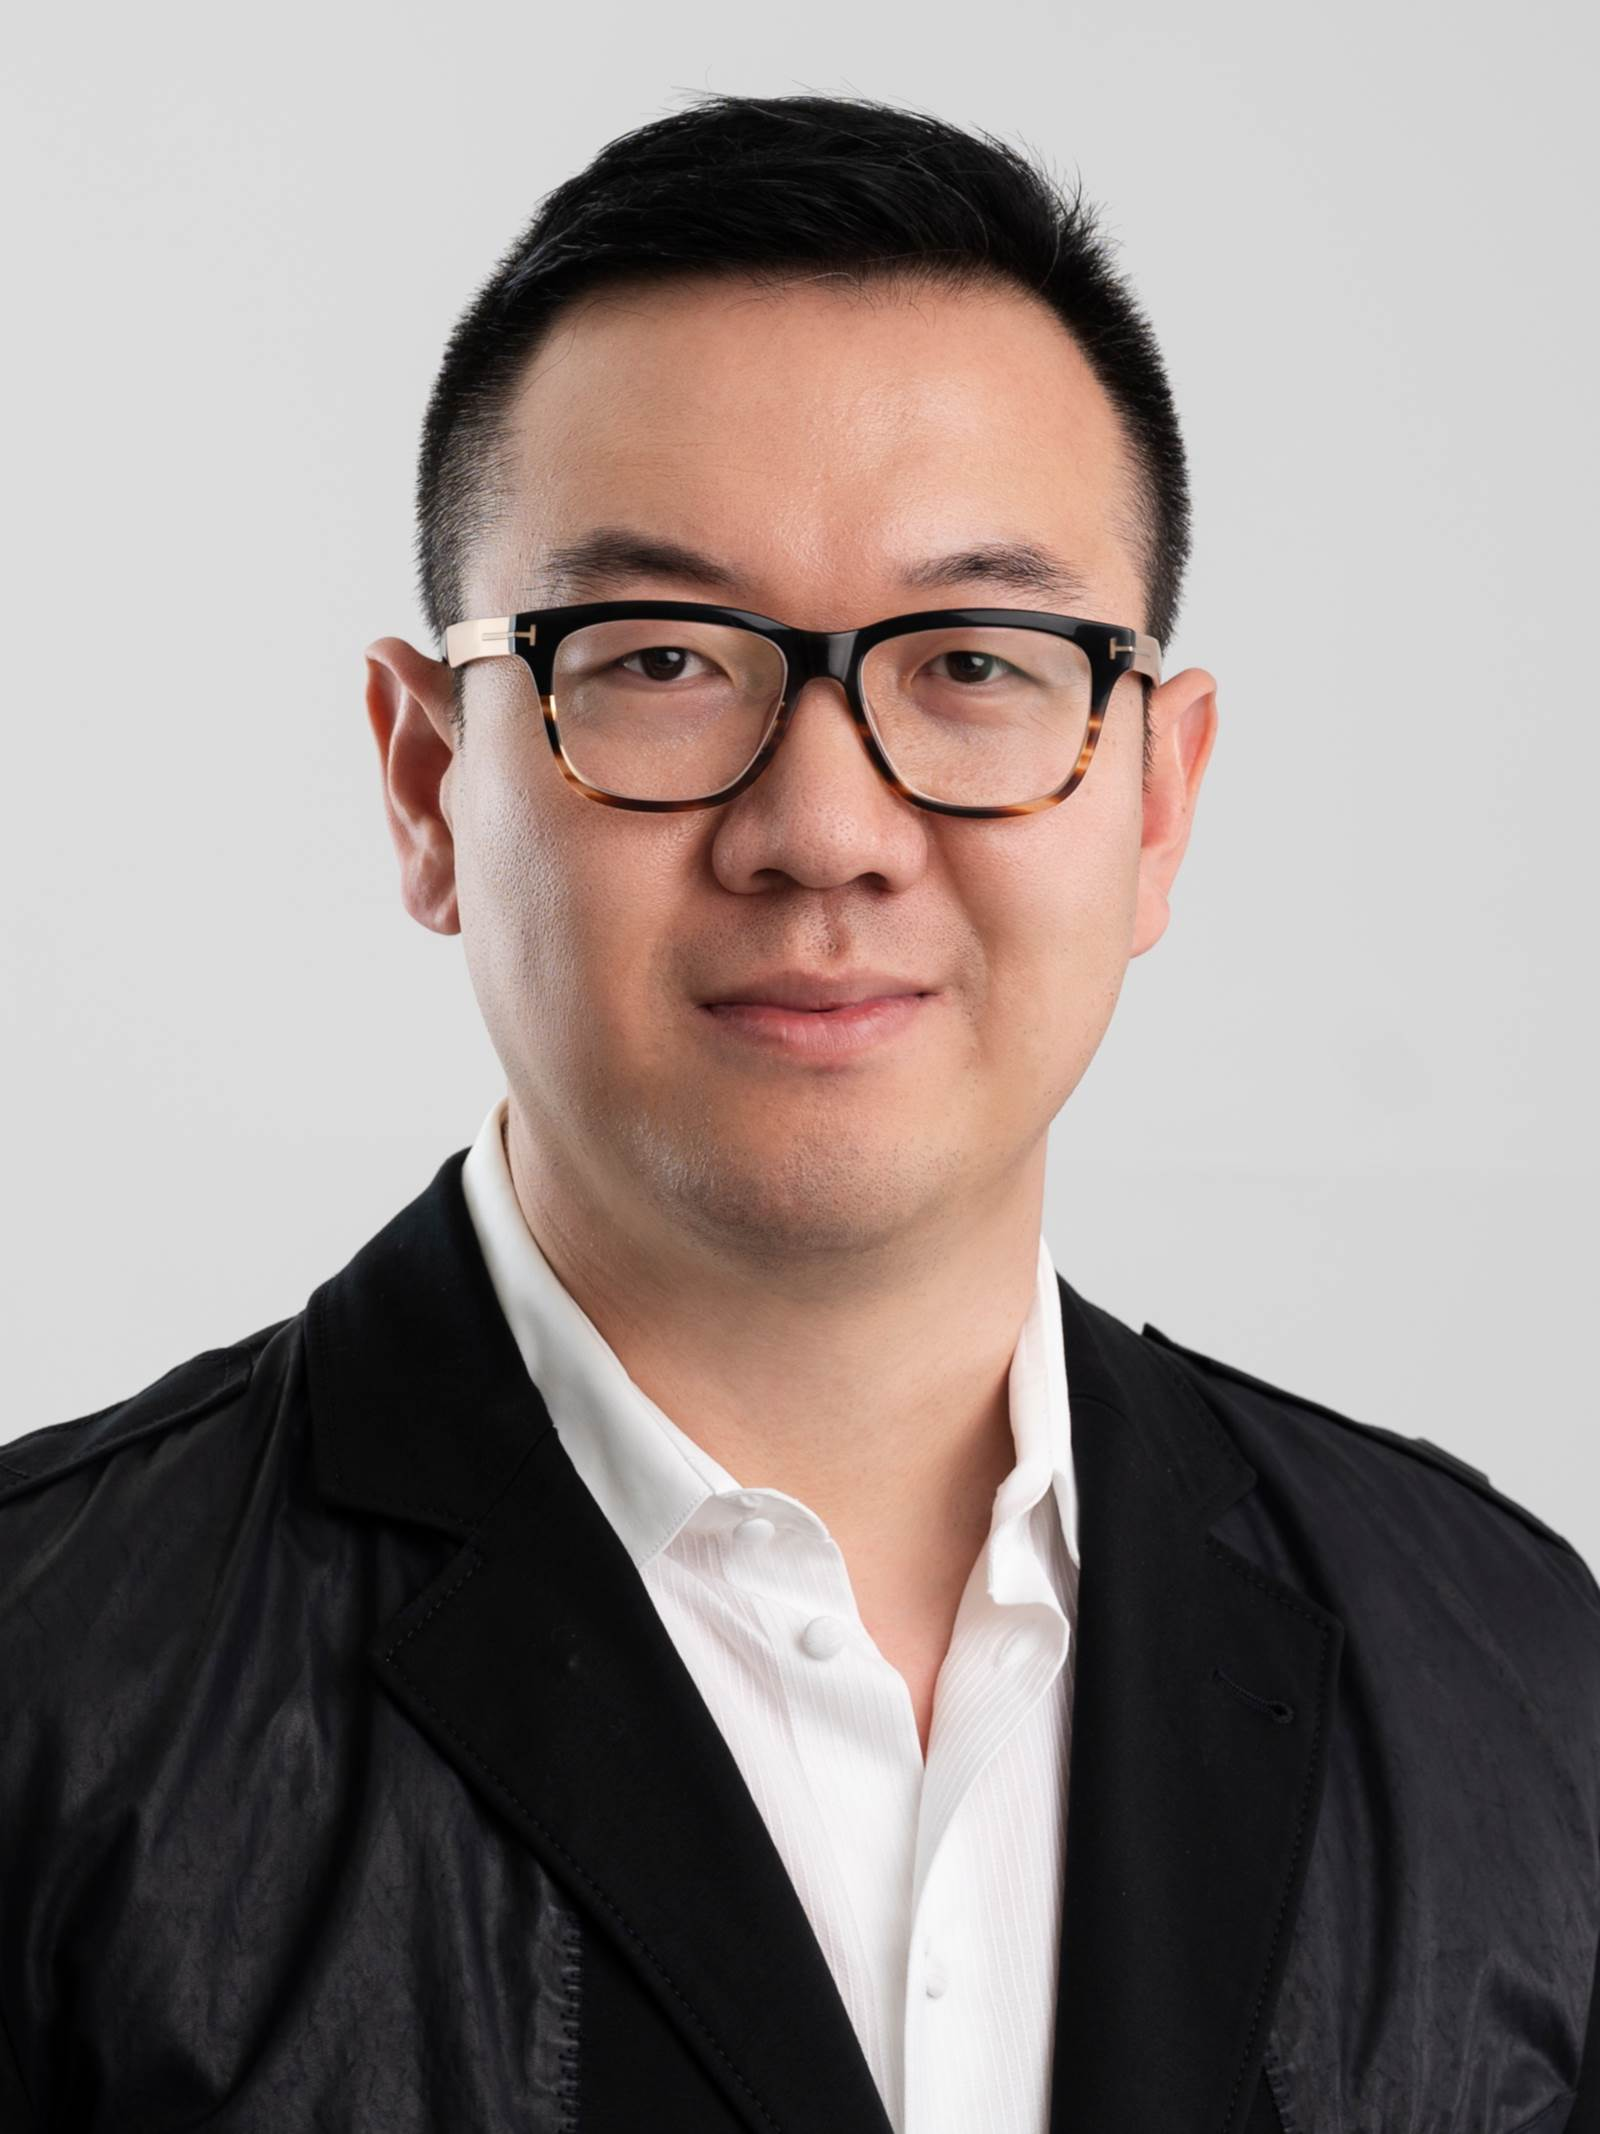 Michael Mi